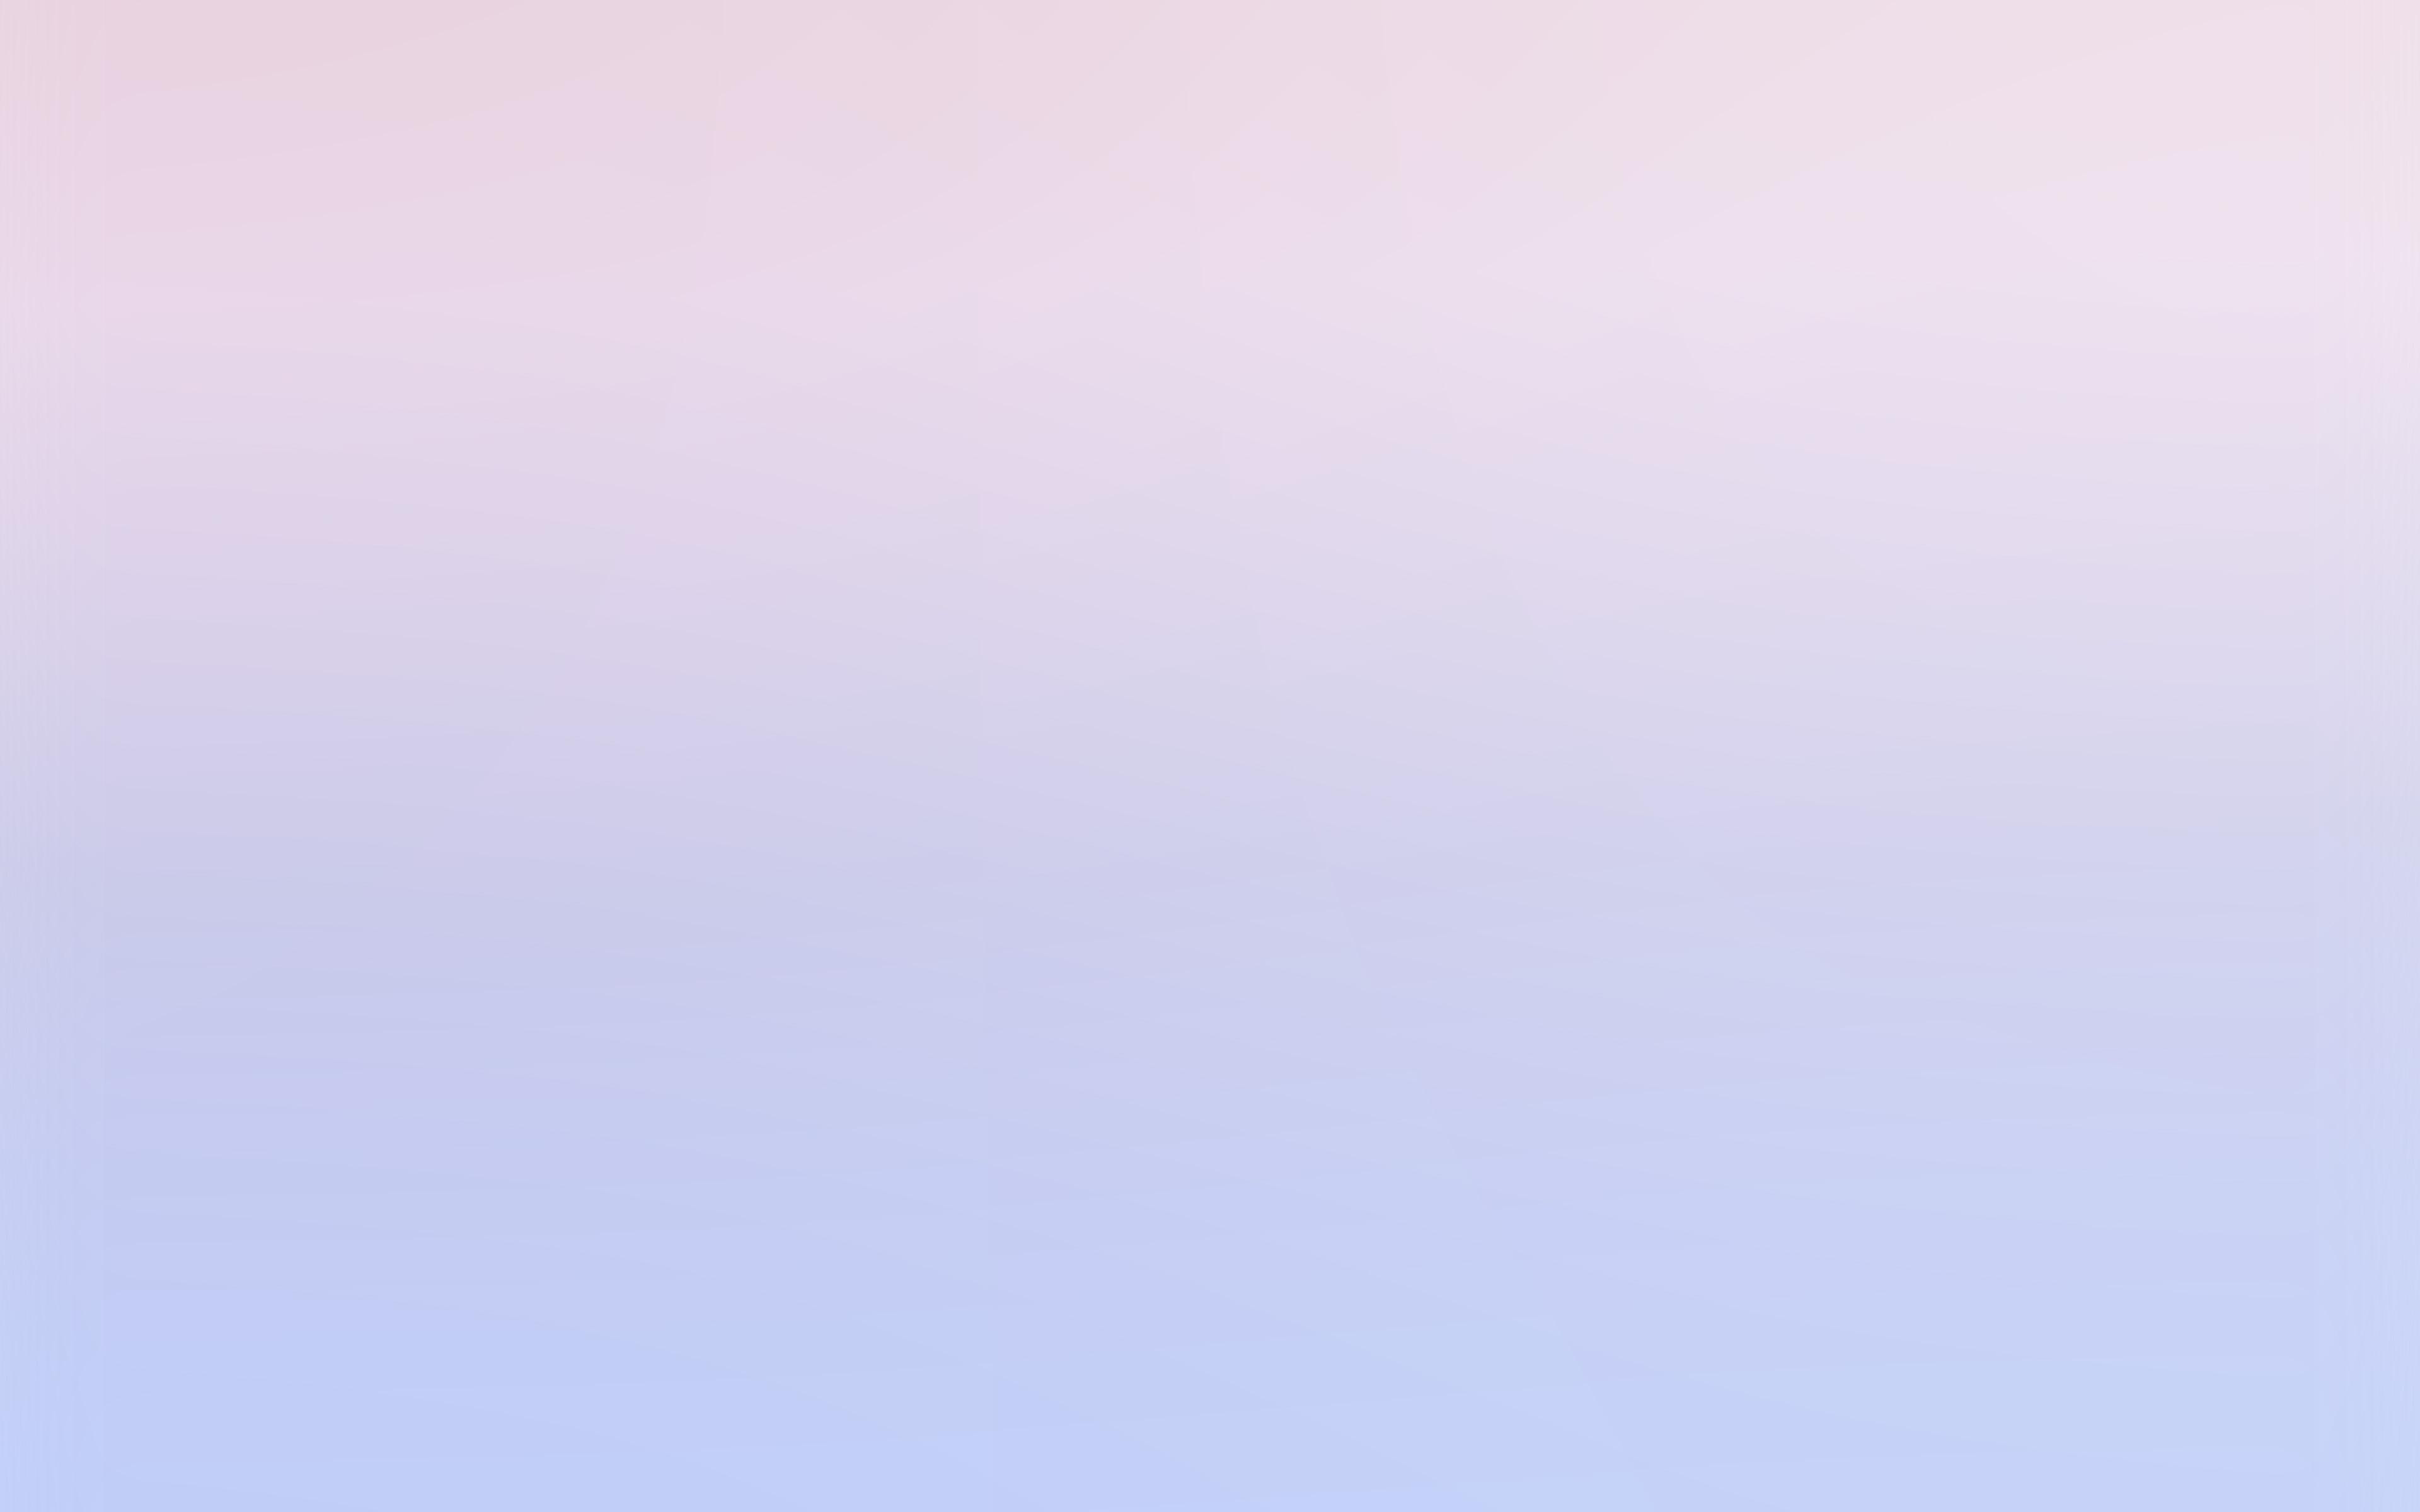 Pink Fall Wallpaper Sm55 Pastel Blue Red Morning Blur Gradation Wallpaper